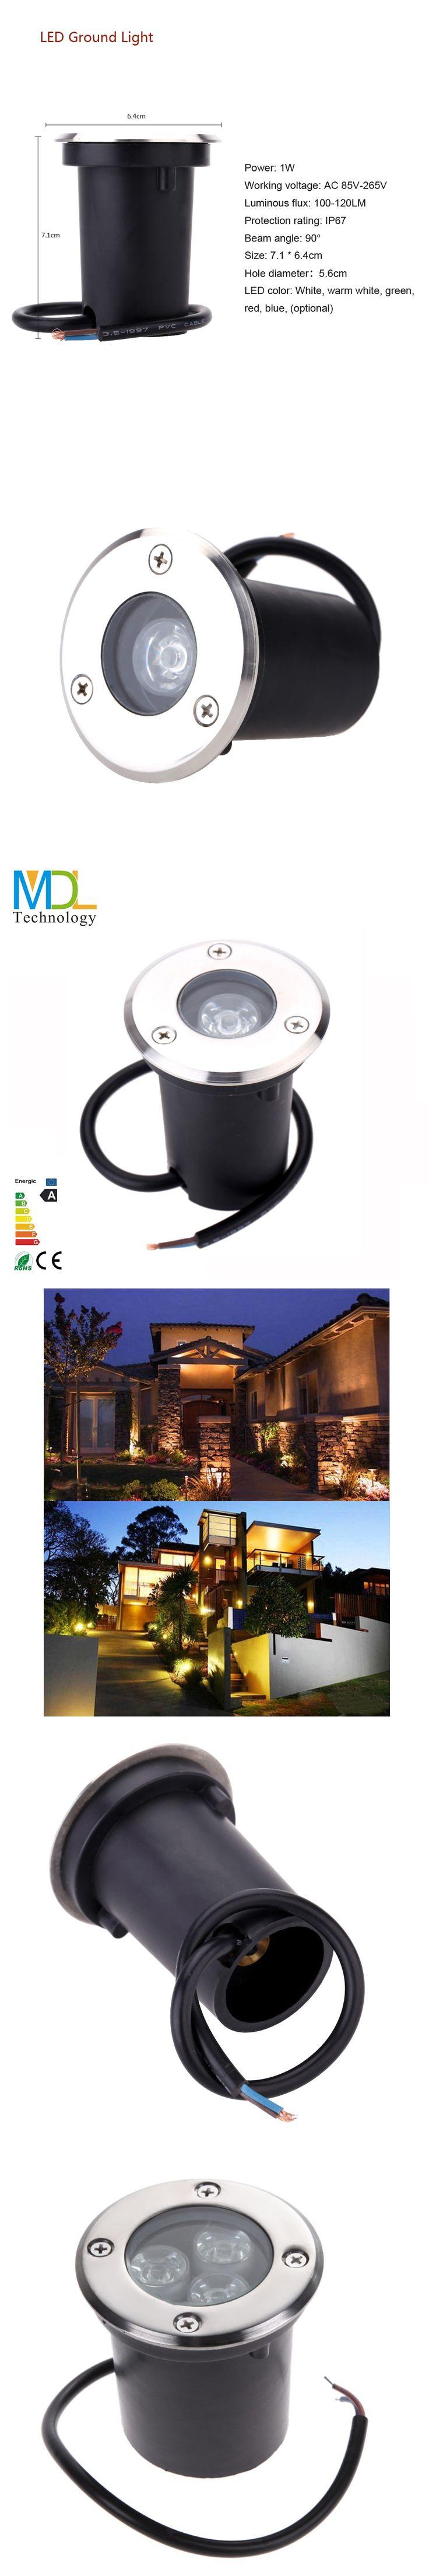 Waterproof LED Underground Light Lamp IP67 Outdoor Spot recessed inground Light 1W 3W Buried Garden Path Lamp AC100-240V